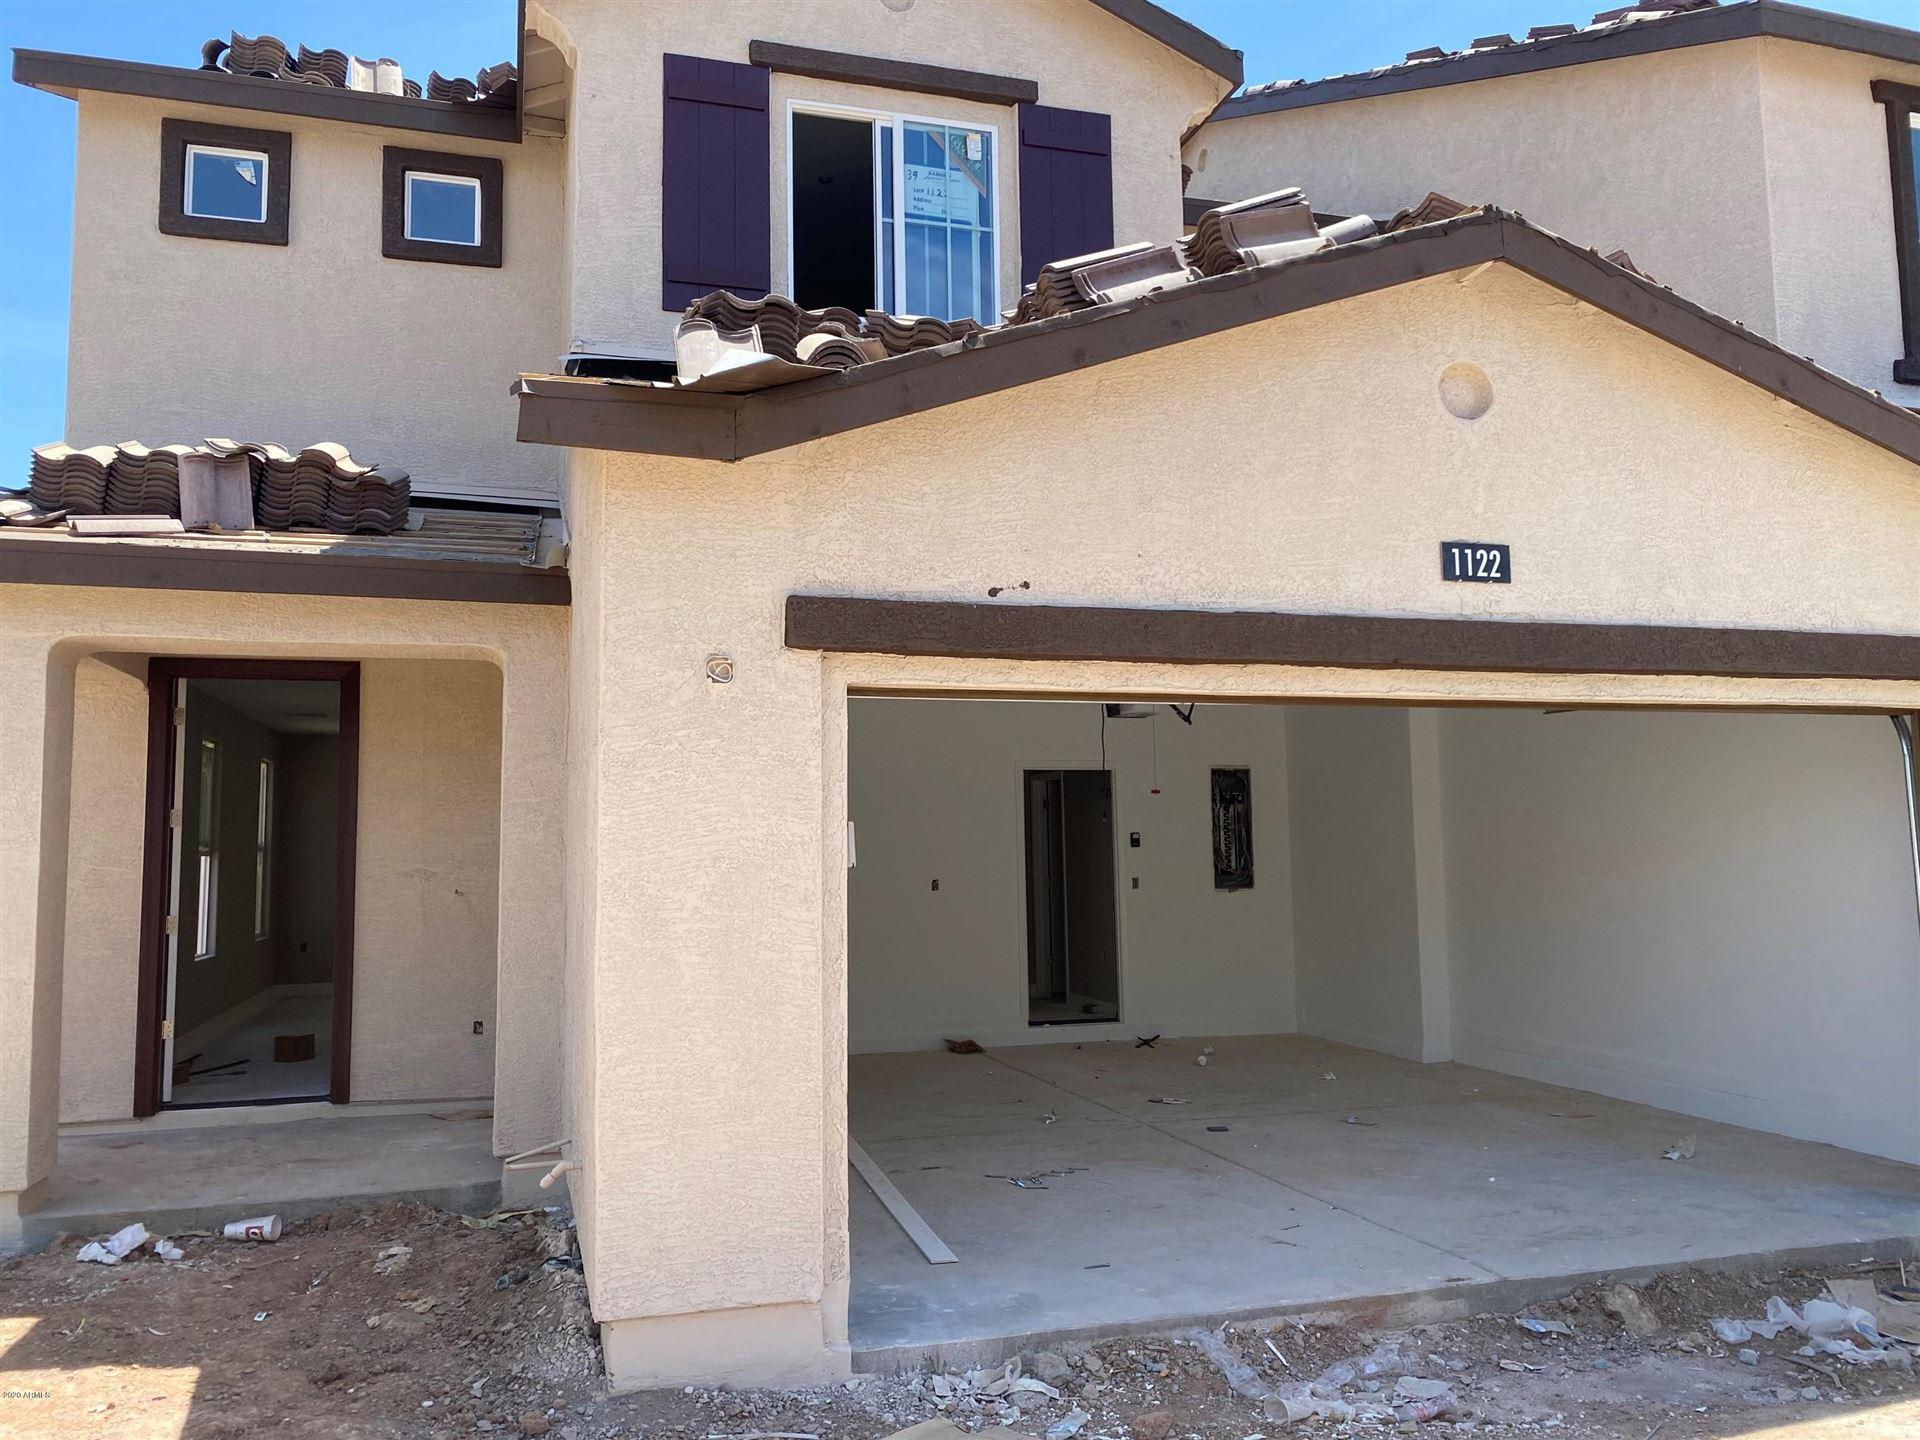 1255 N ARIZONA Avenue #1122, Chandler, AZ 85225 - #: 6032544